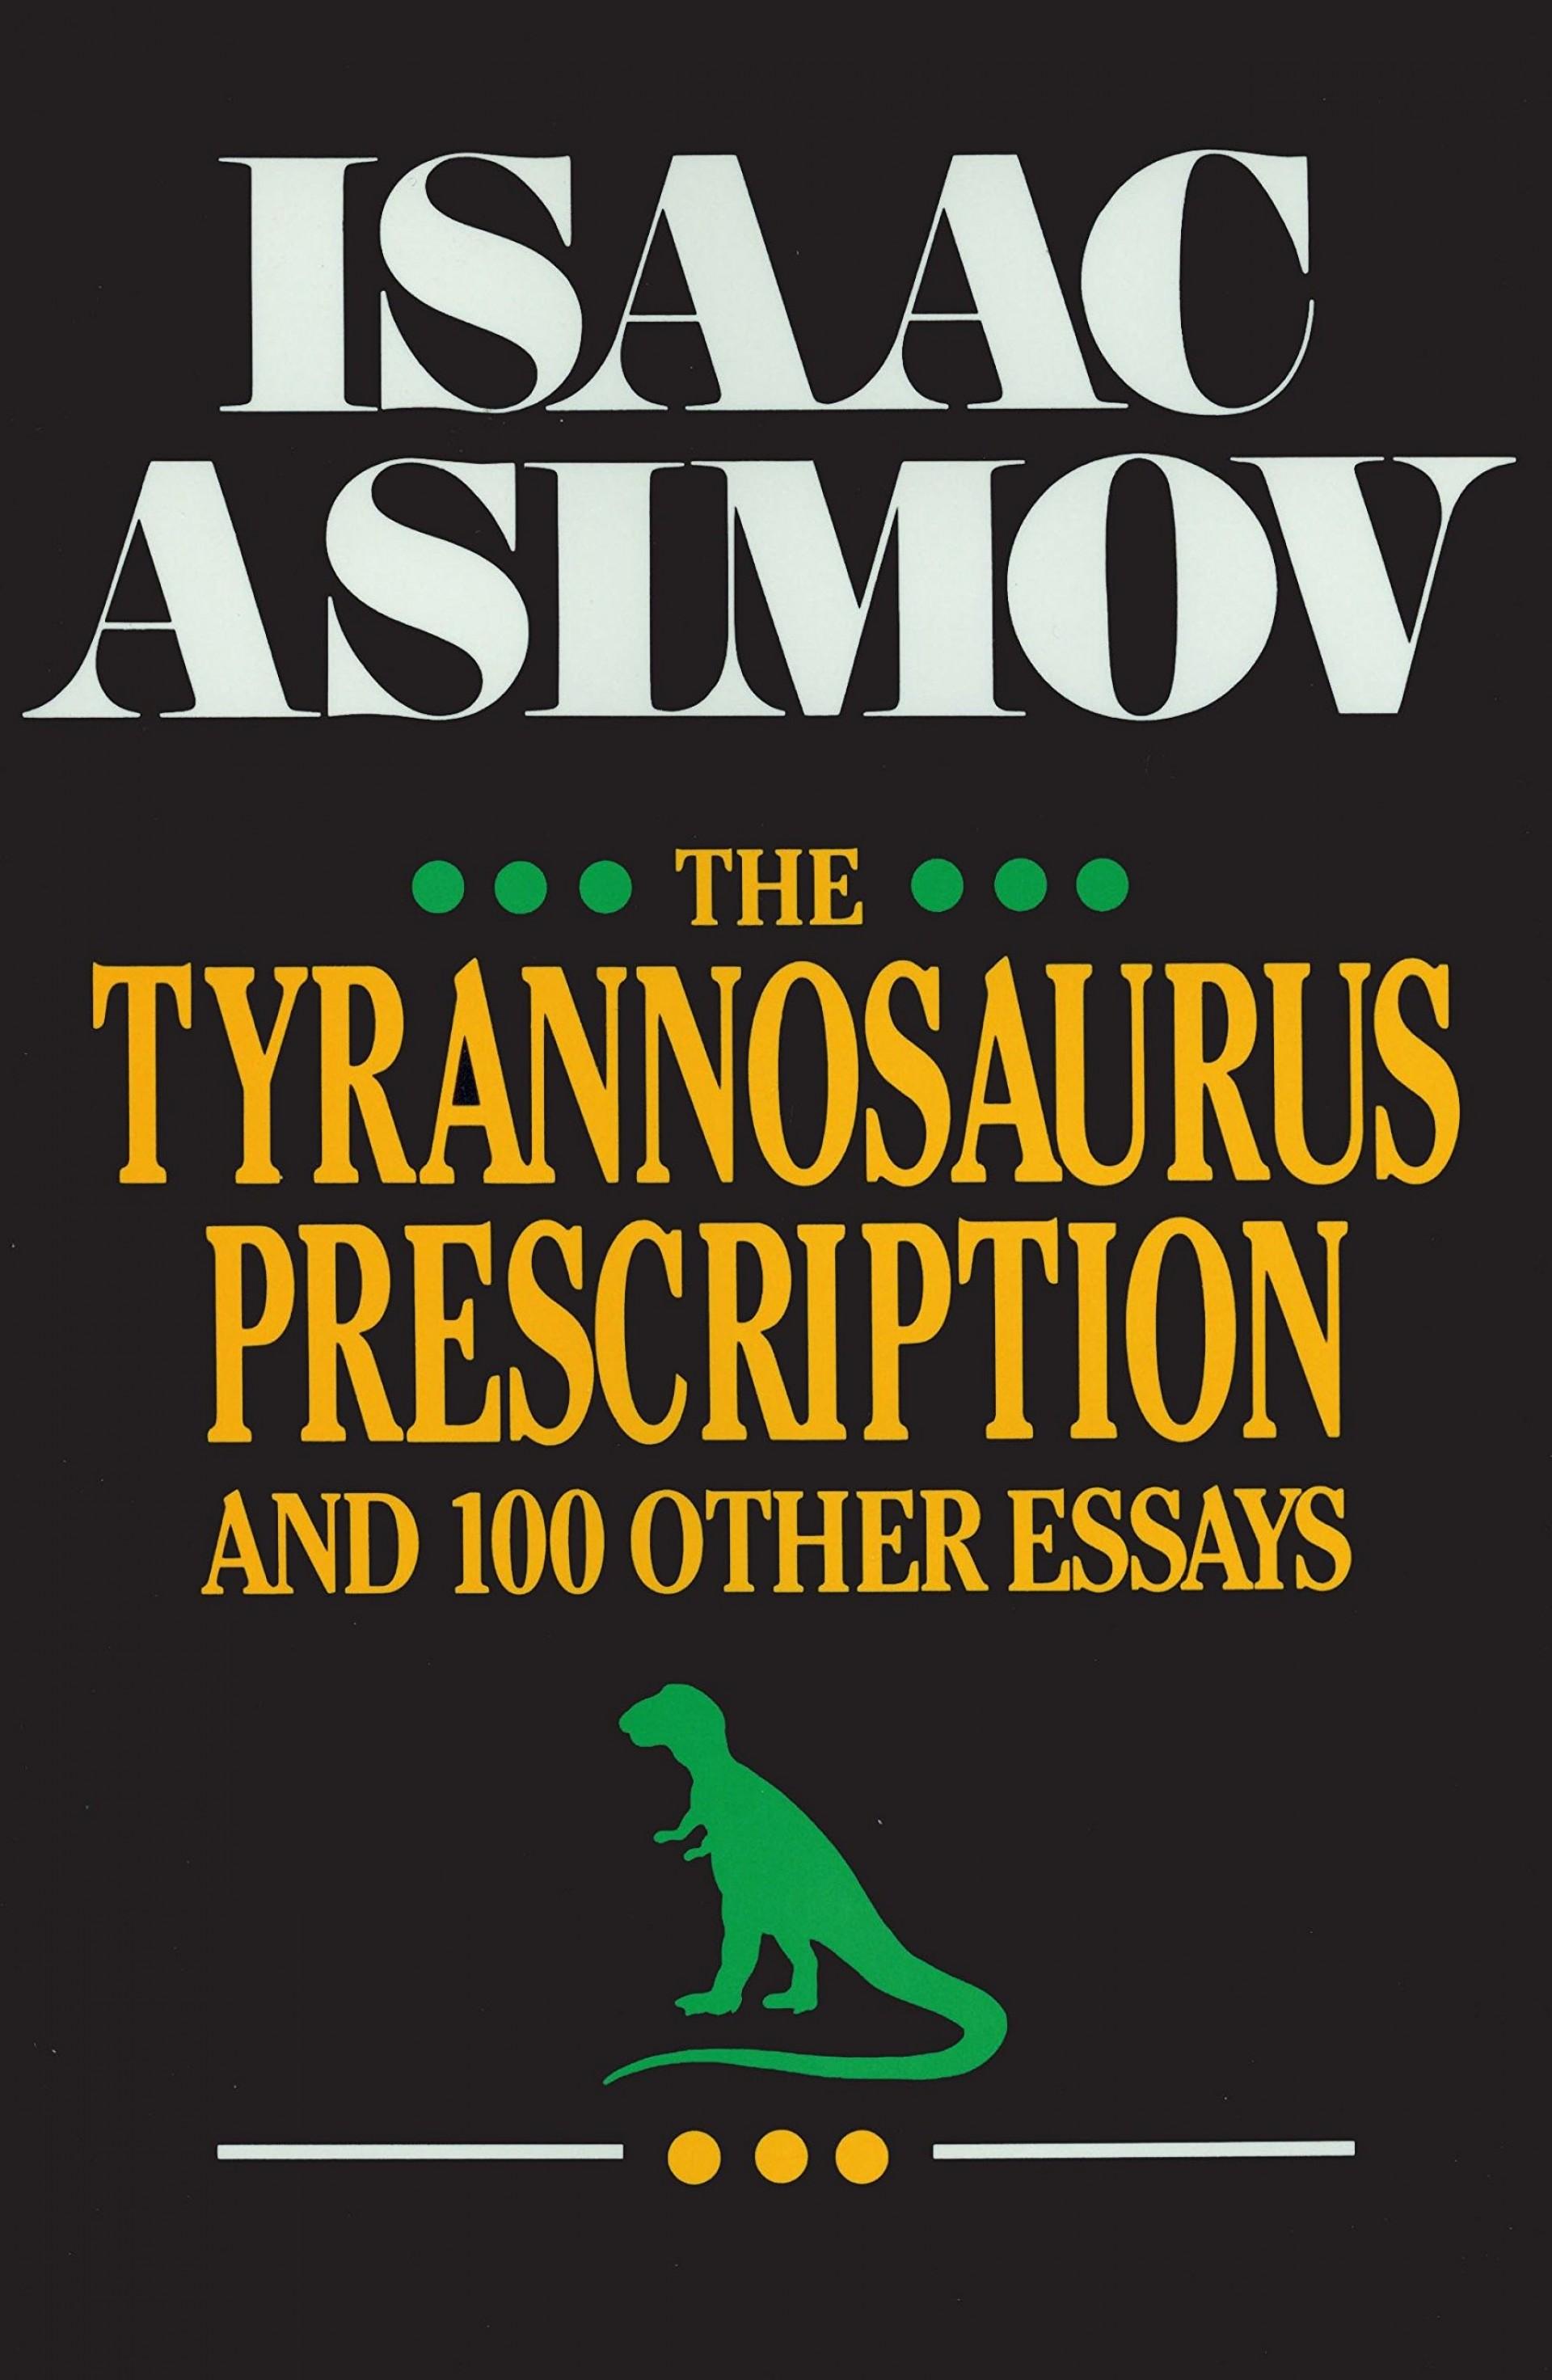 006 Essay Example Isaac Asimov Essays Awful On Creativity Intelligence 1920